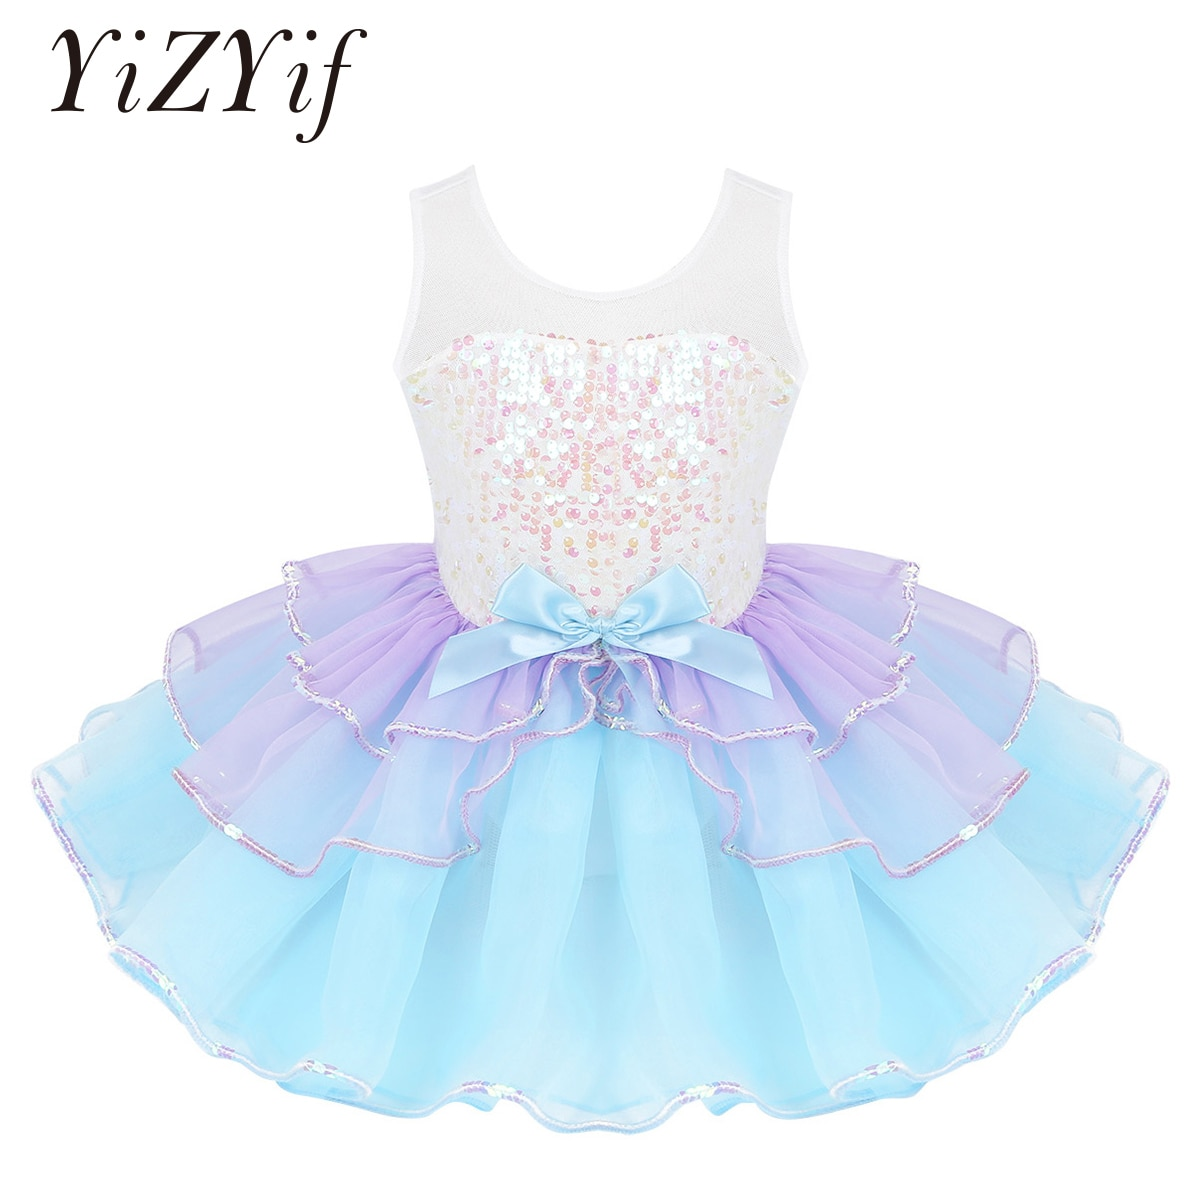 Stage & Dance Wear